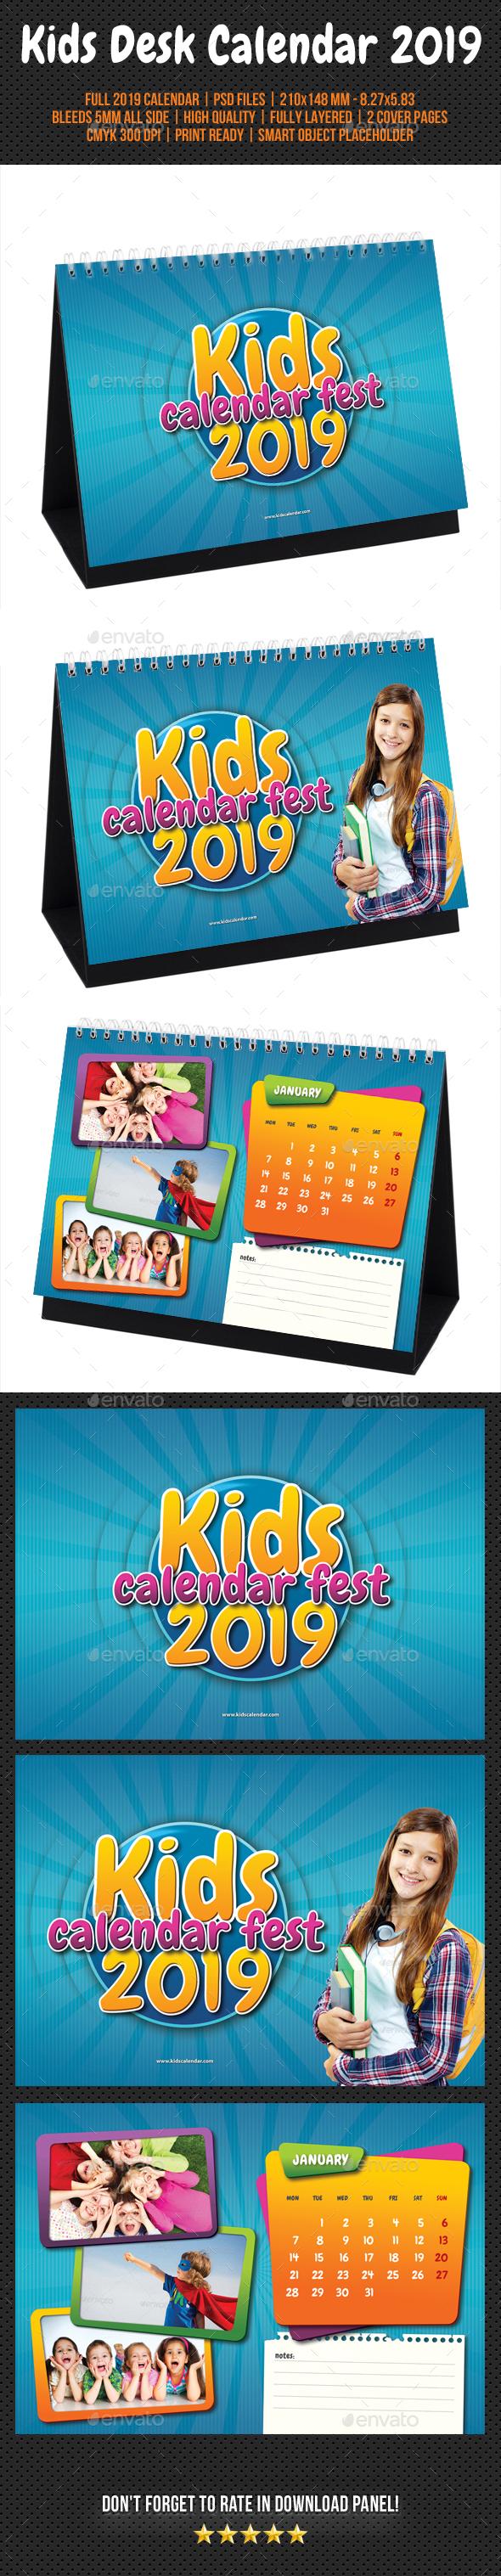 Kids Desk Calendar 2019 - Calendars Stationery